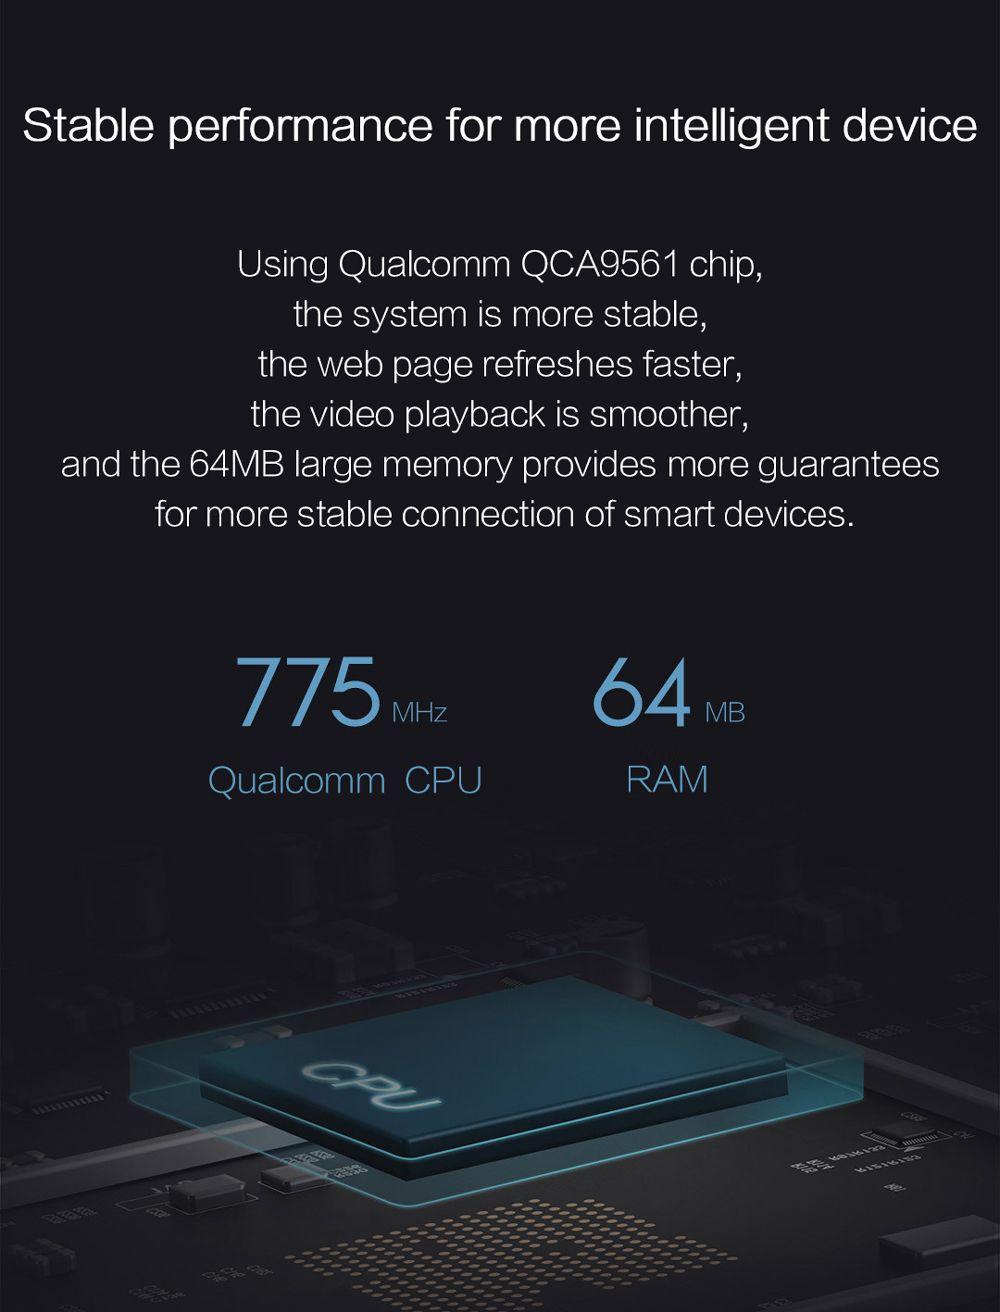 New Original Xiaomi Mi Router 4Q 3 Antennas Blue Wireless 2.4G 802.11bgn 450Mbps APP Control 64M ROMRAM Wifi Wireless Routers-5